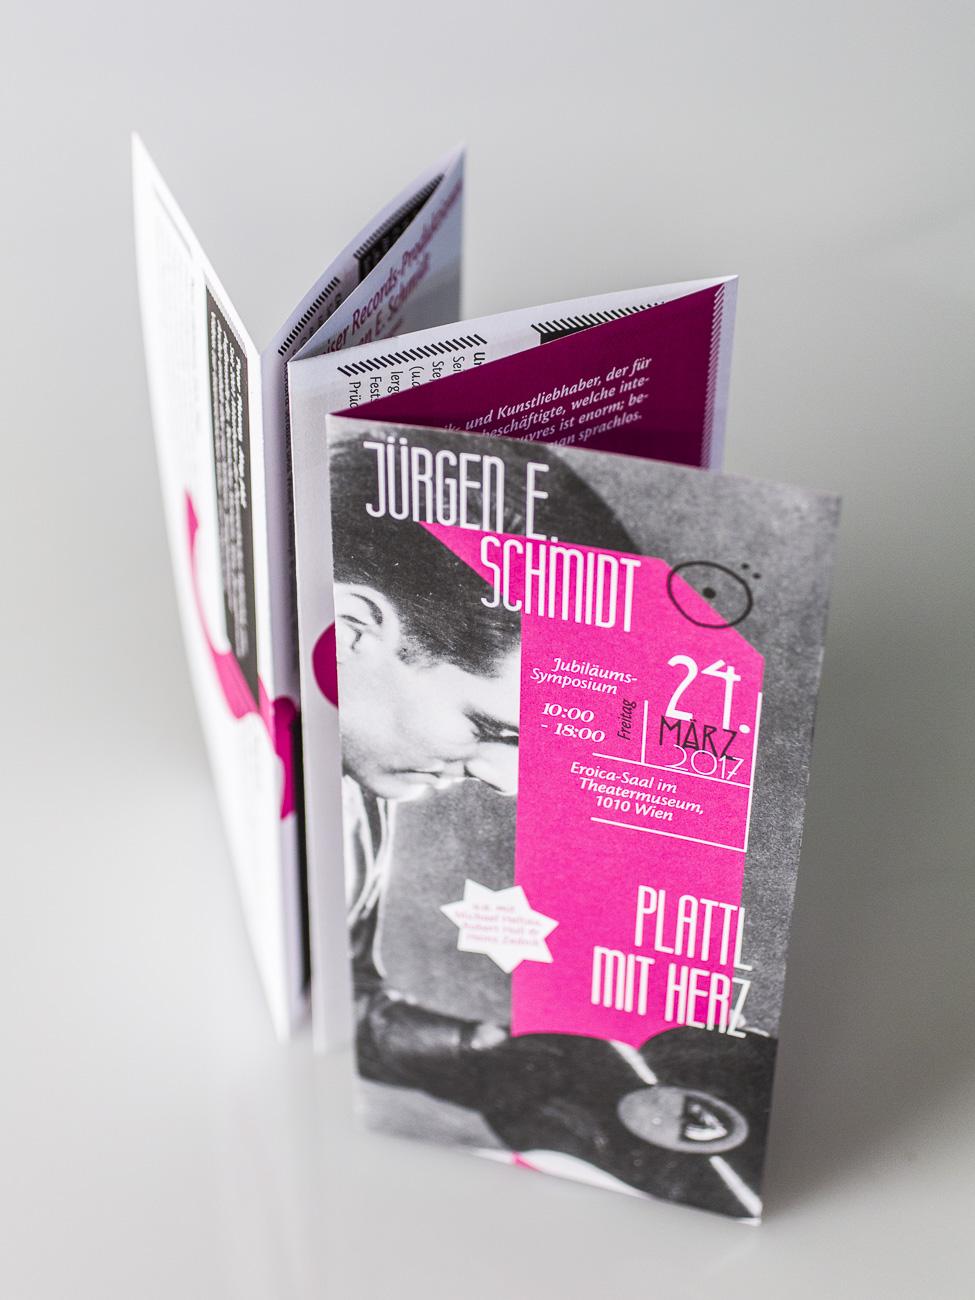 PlattlMitHerz-KatalogMockup-2.jpg